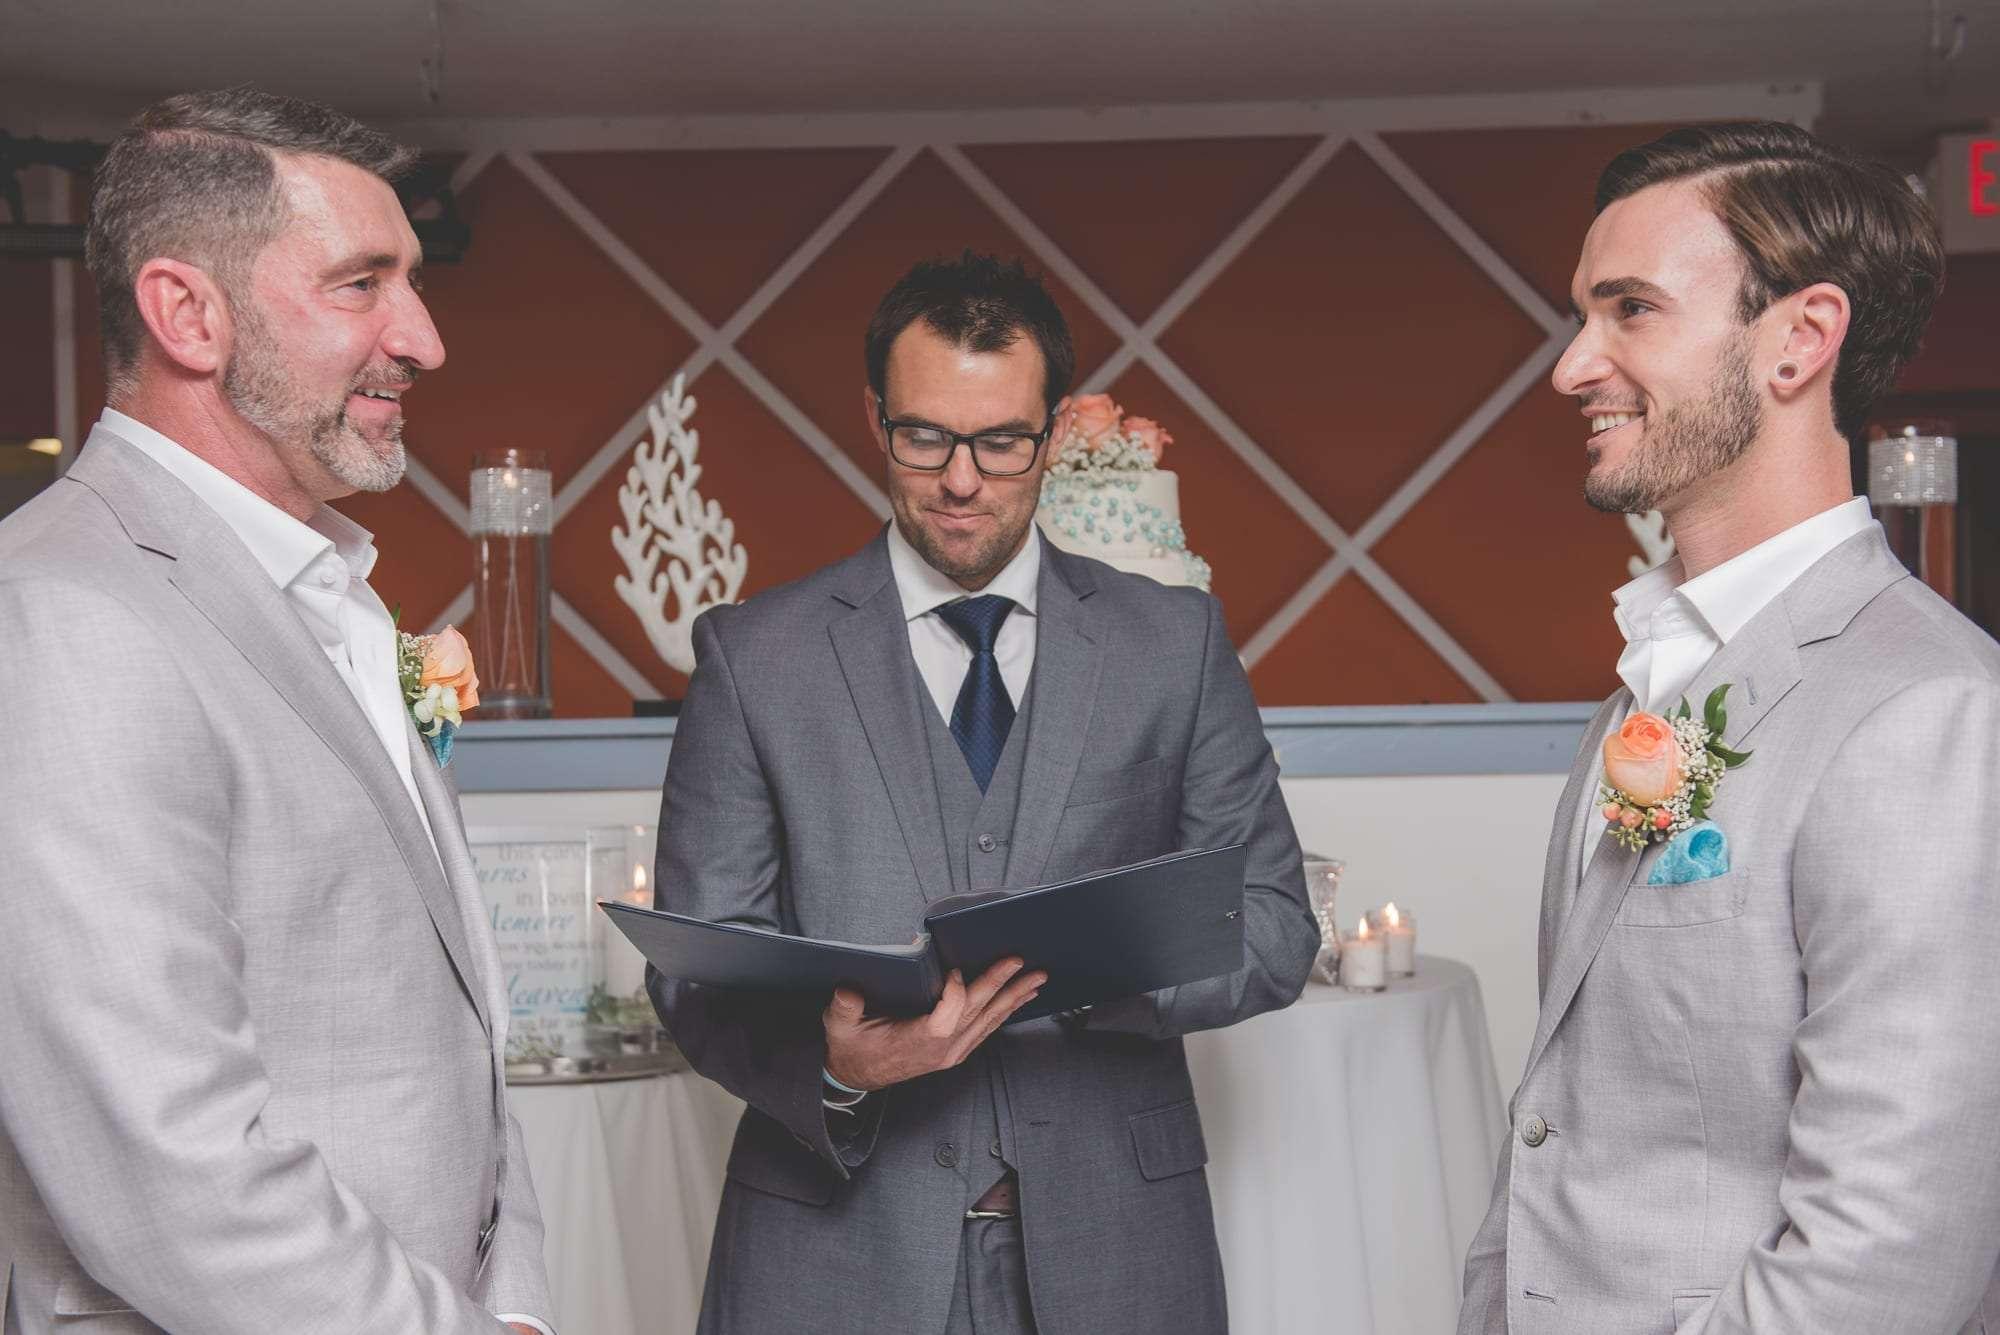 Longport new jersey wedding photographer